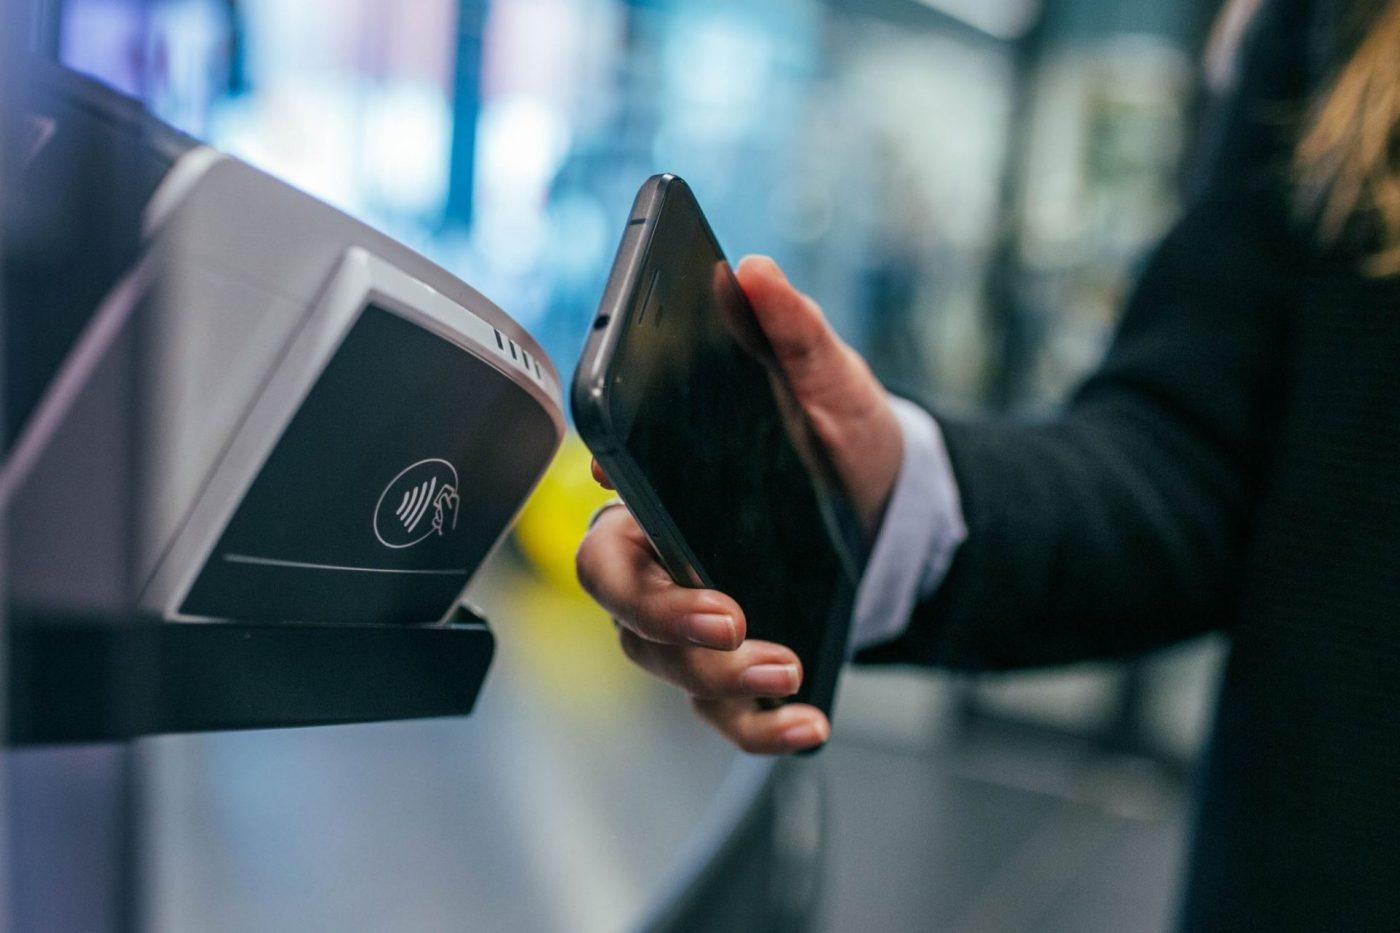 tipjar cashless payments